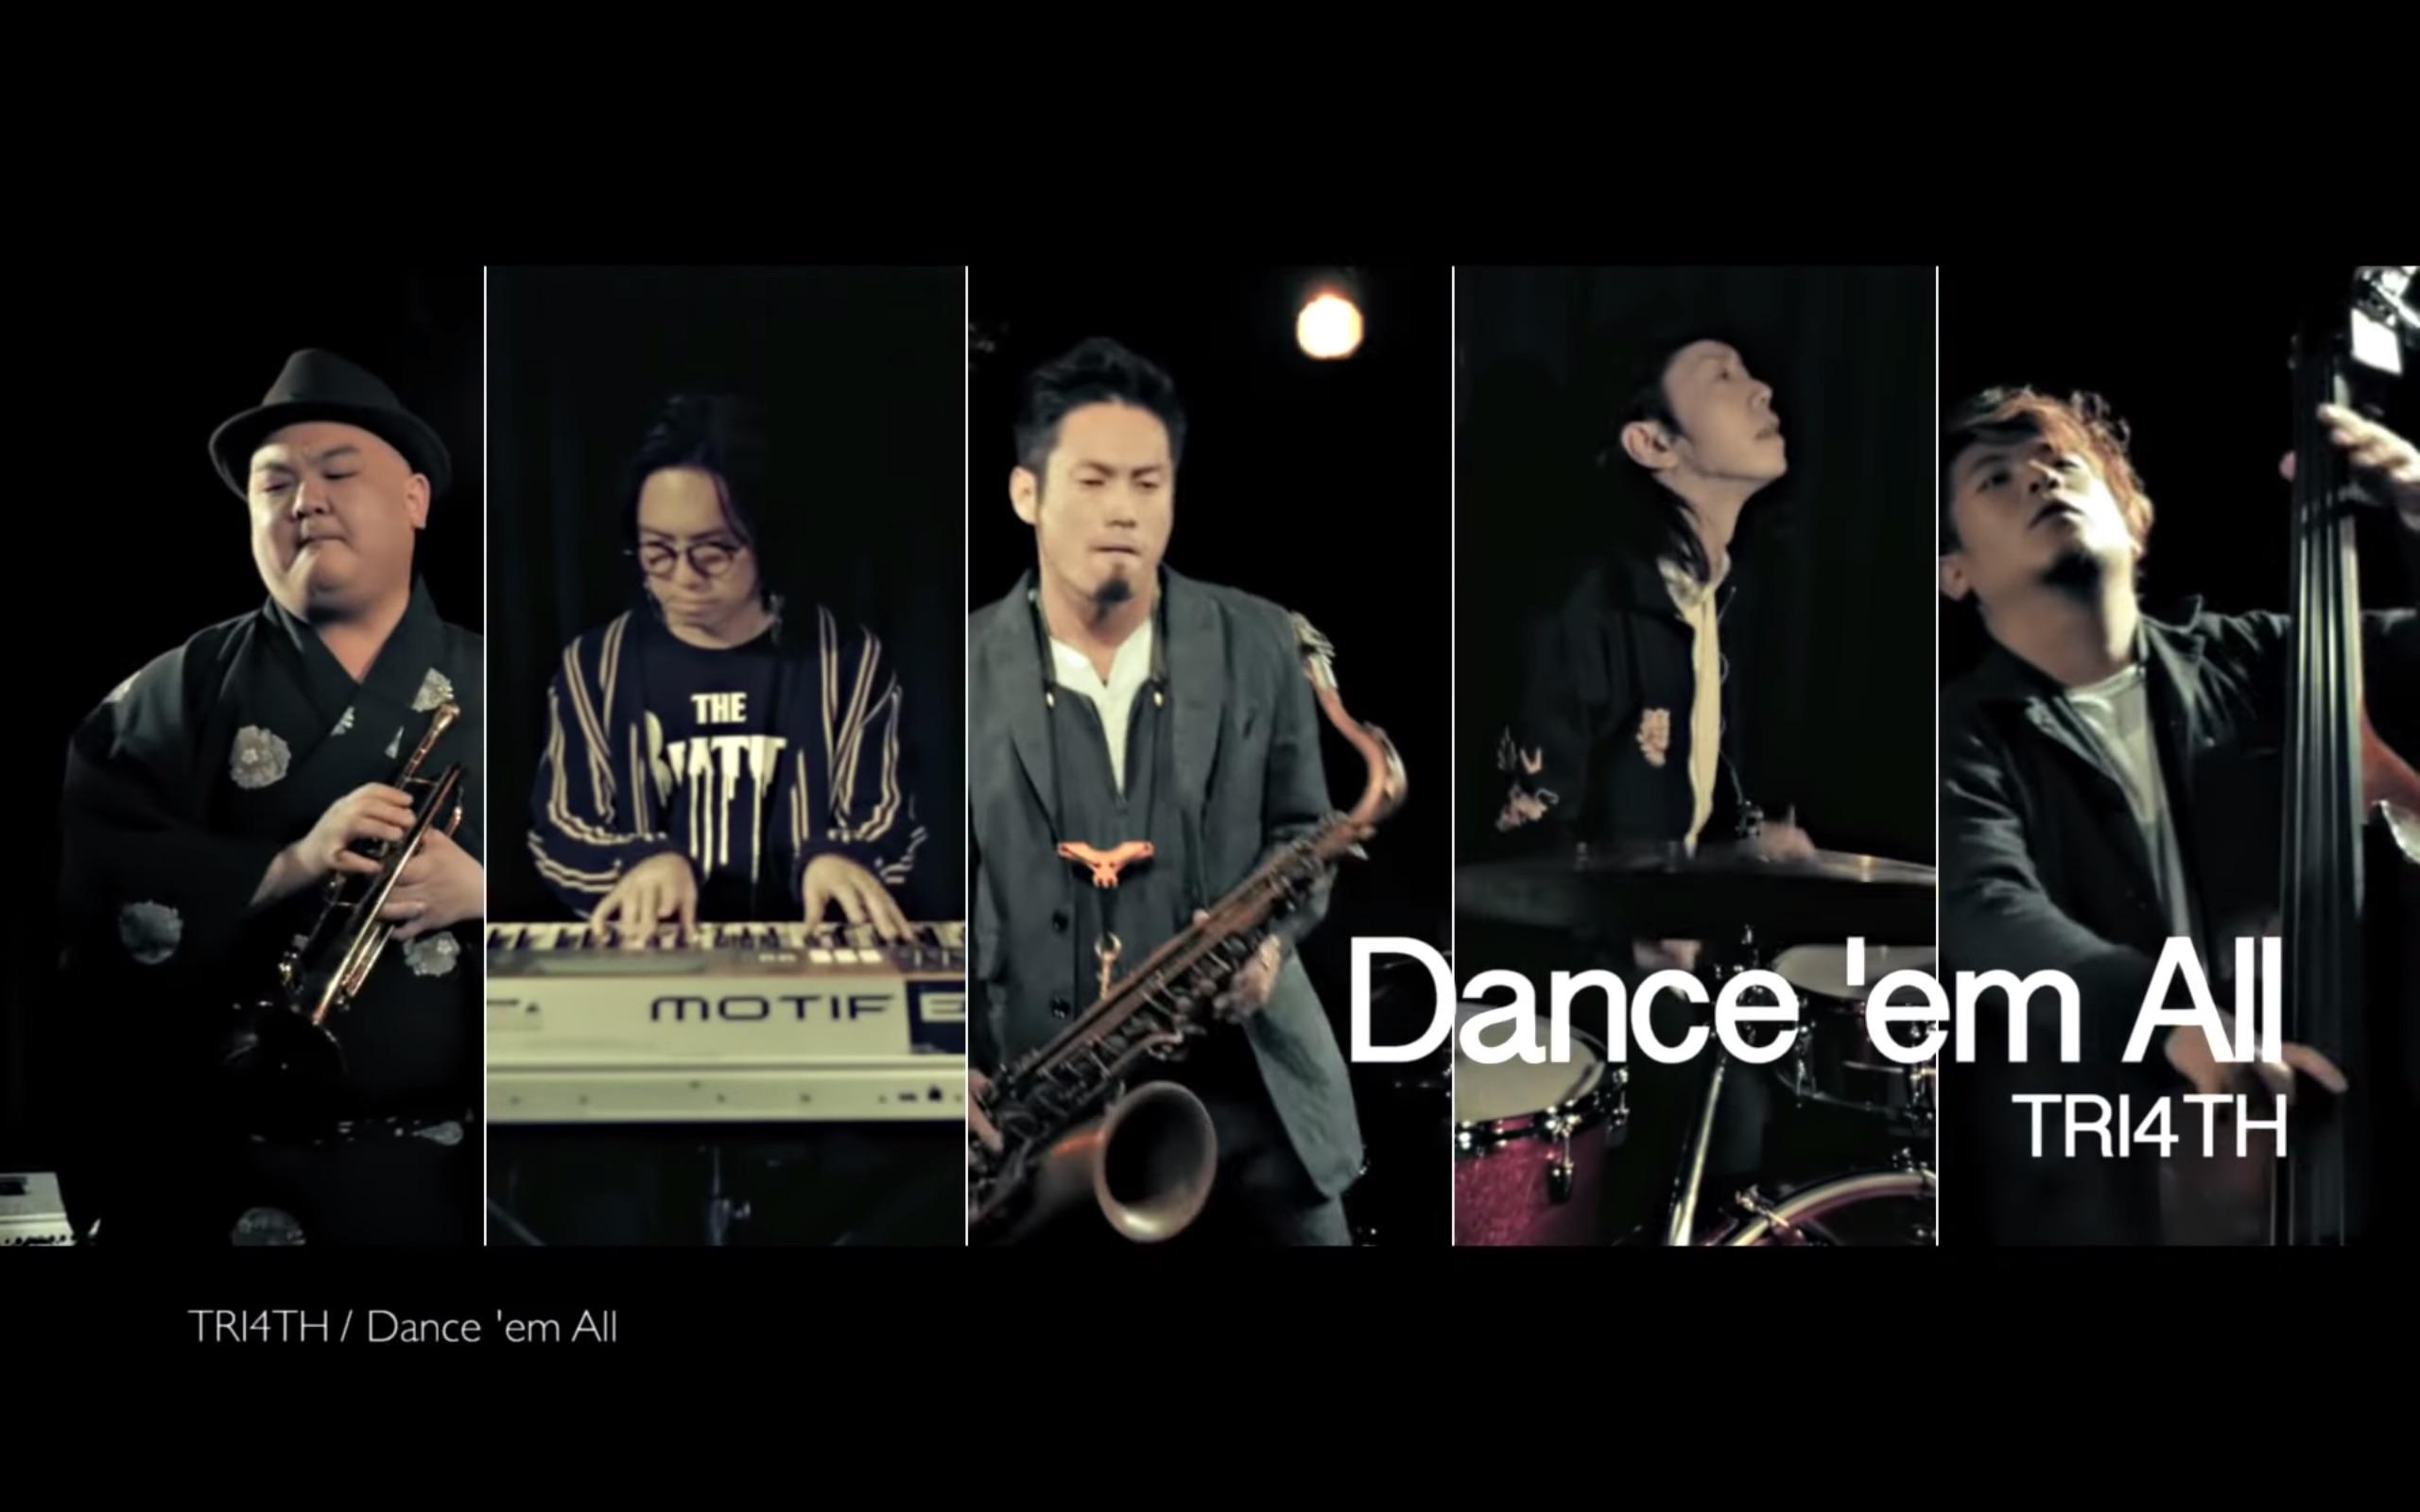 Dance 'em All / TRI4TH